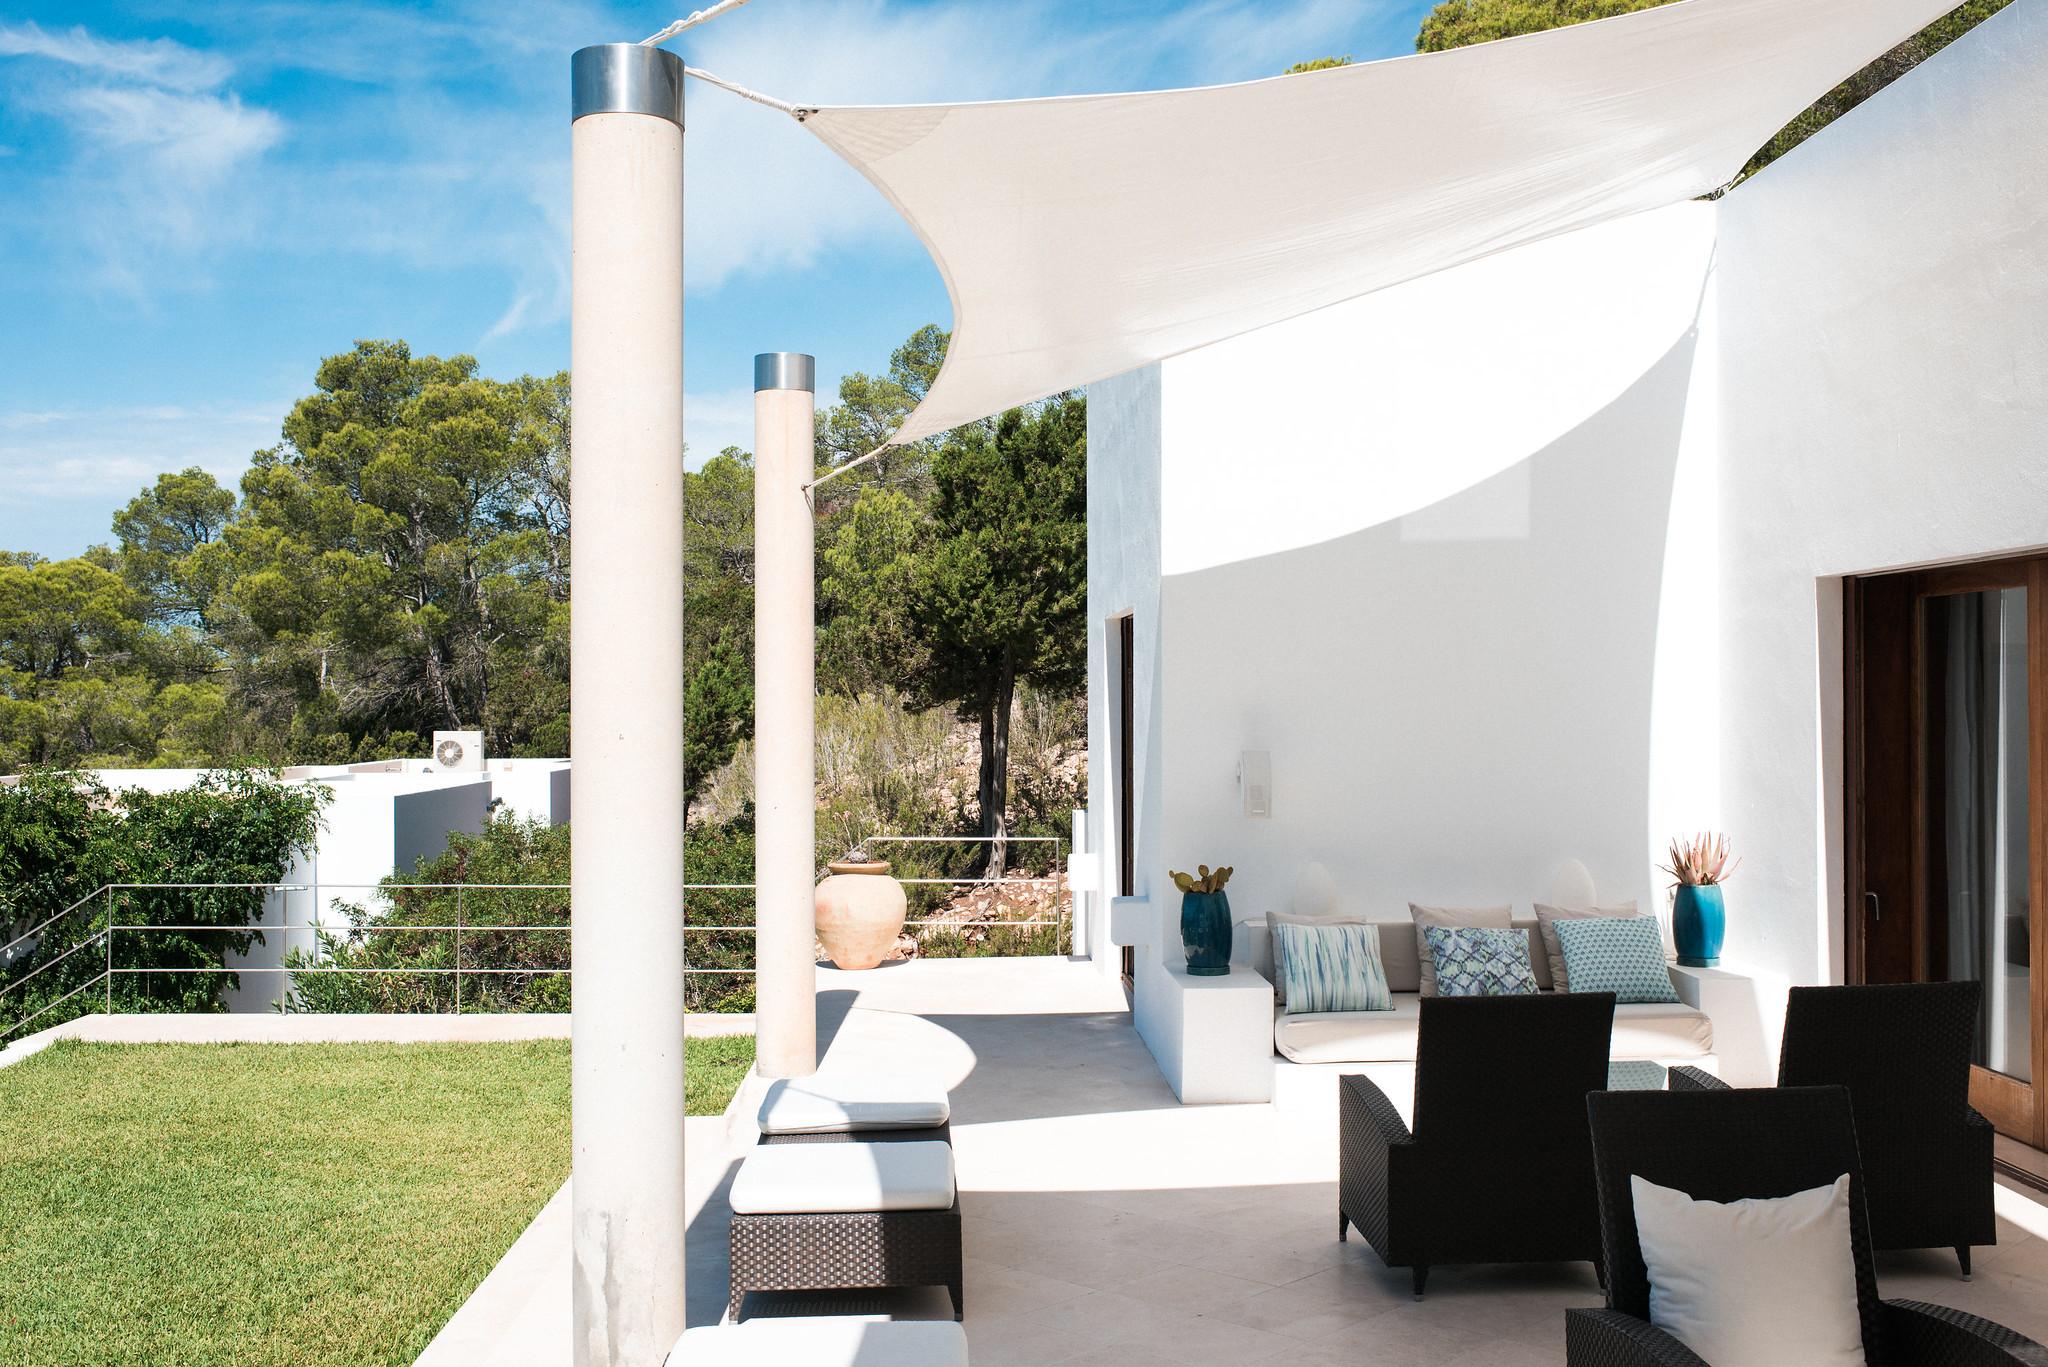 https://www.white-ibiza.com/wp-content/uploads/2020/05/white-ibiza-villas-can-ava-outside-seating.jpg